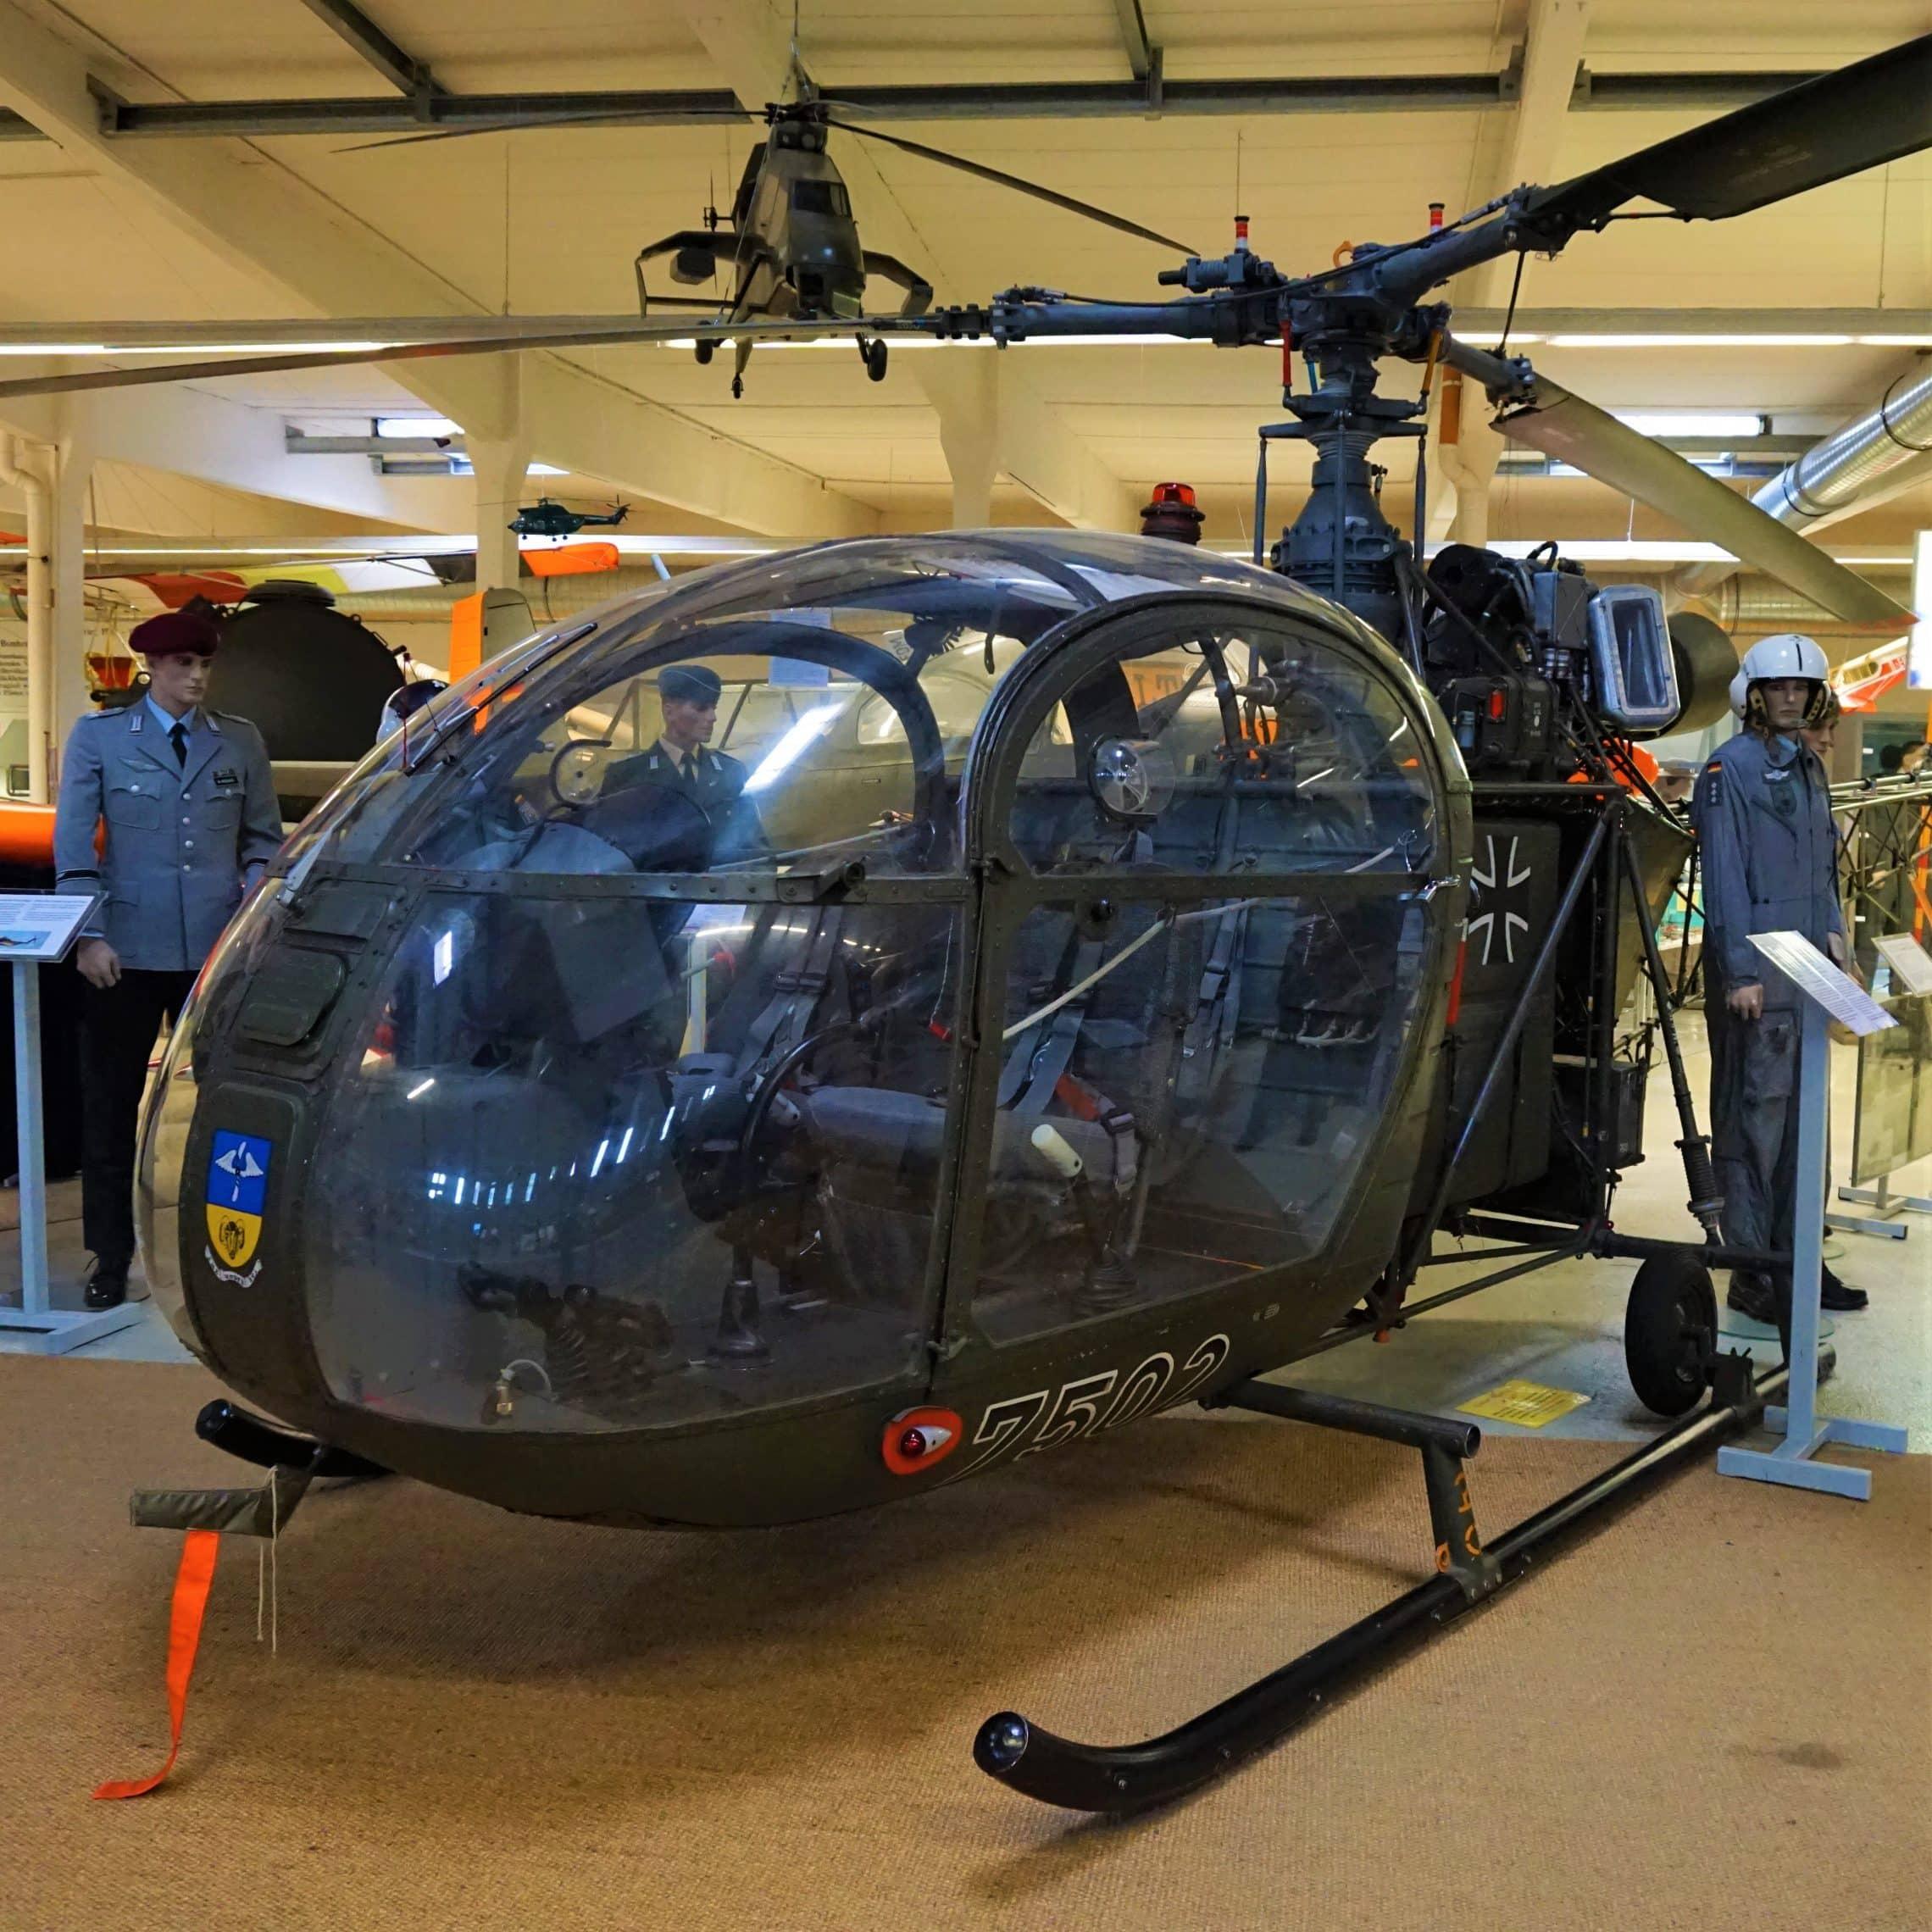 Style Hannover Luftfahrtmuseum Laatzen 4 scaled - Luftfahrtmuseum Laatzen – ein Traum für jeden Luftfahrtinteressierten